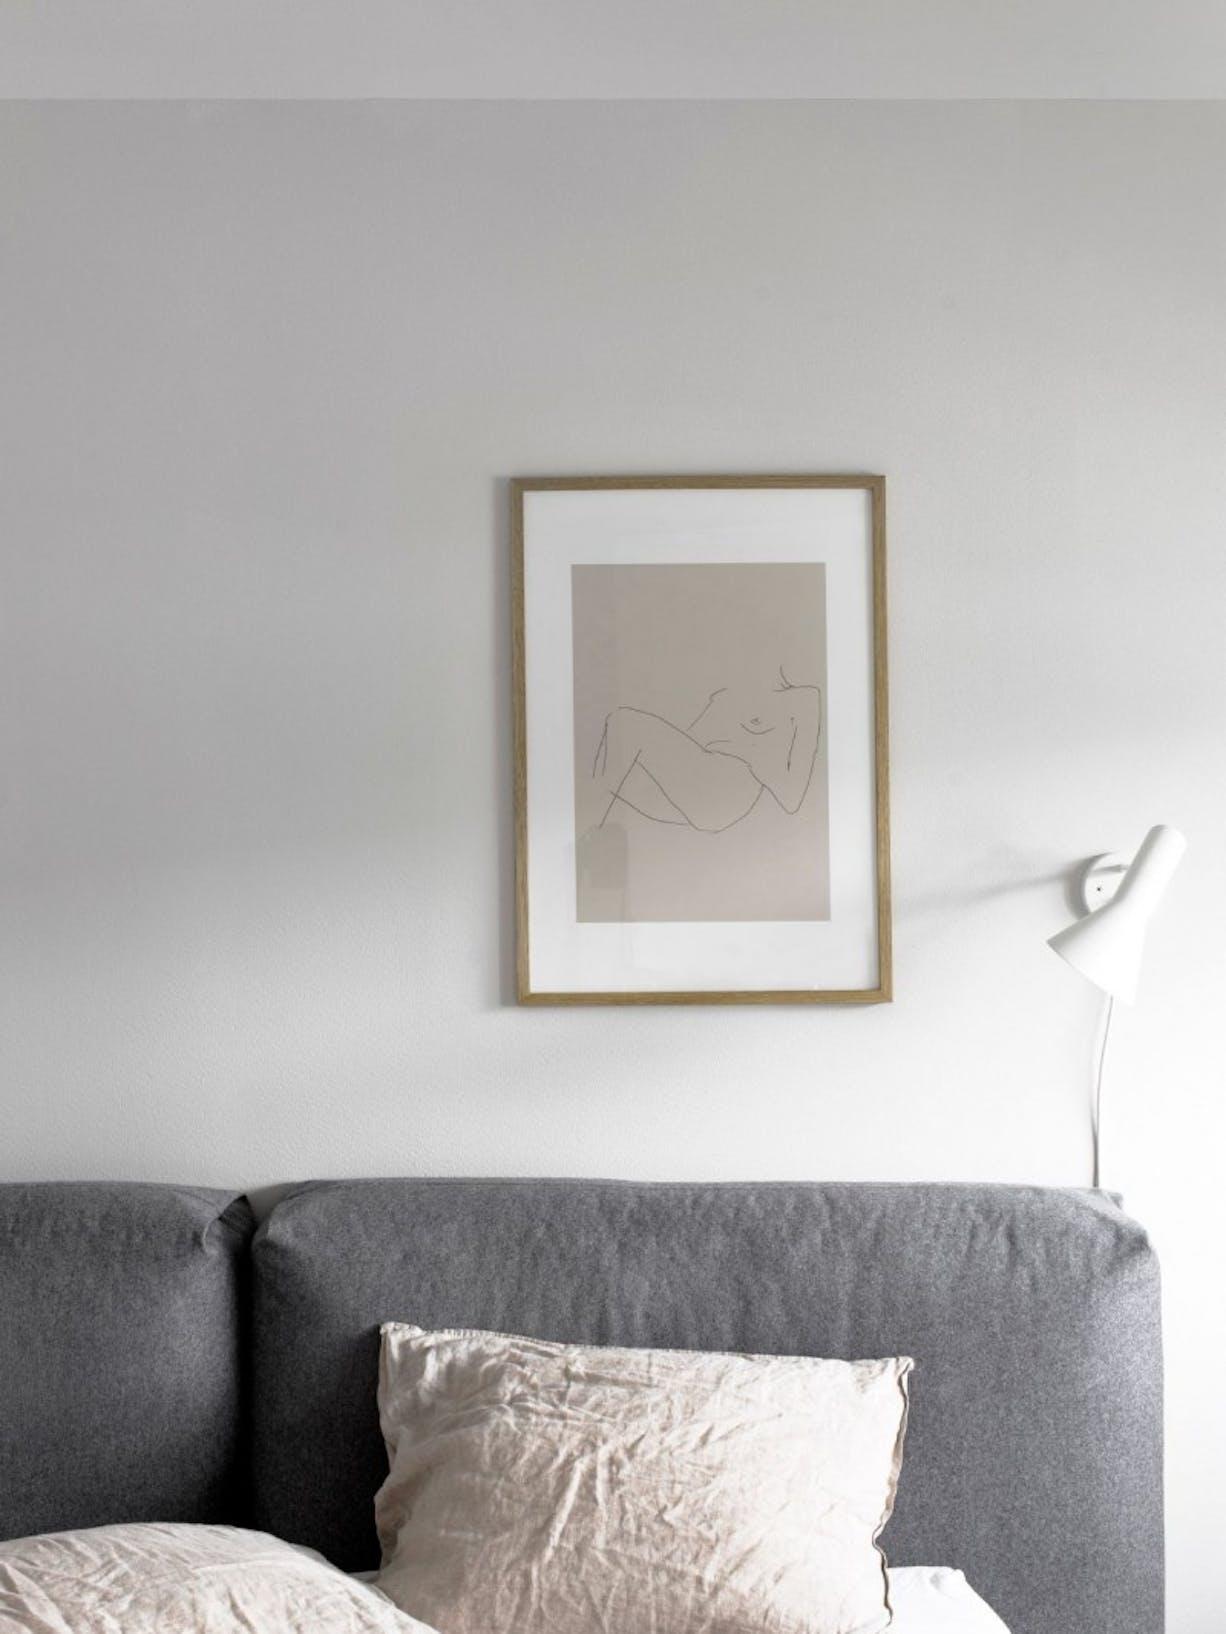 White Bedroom Walls - Tikkurila UK left image